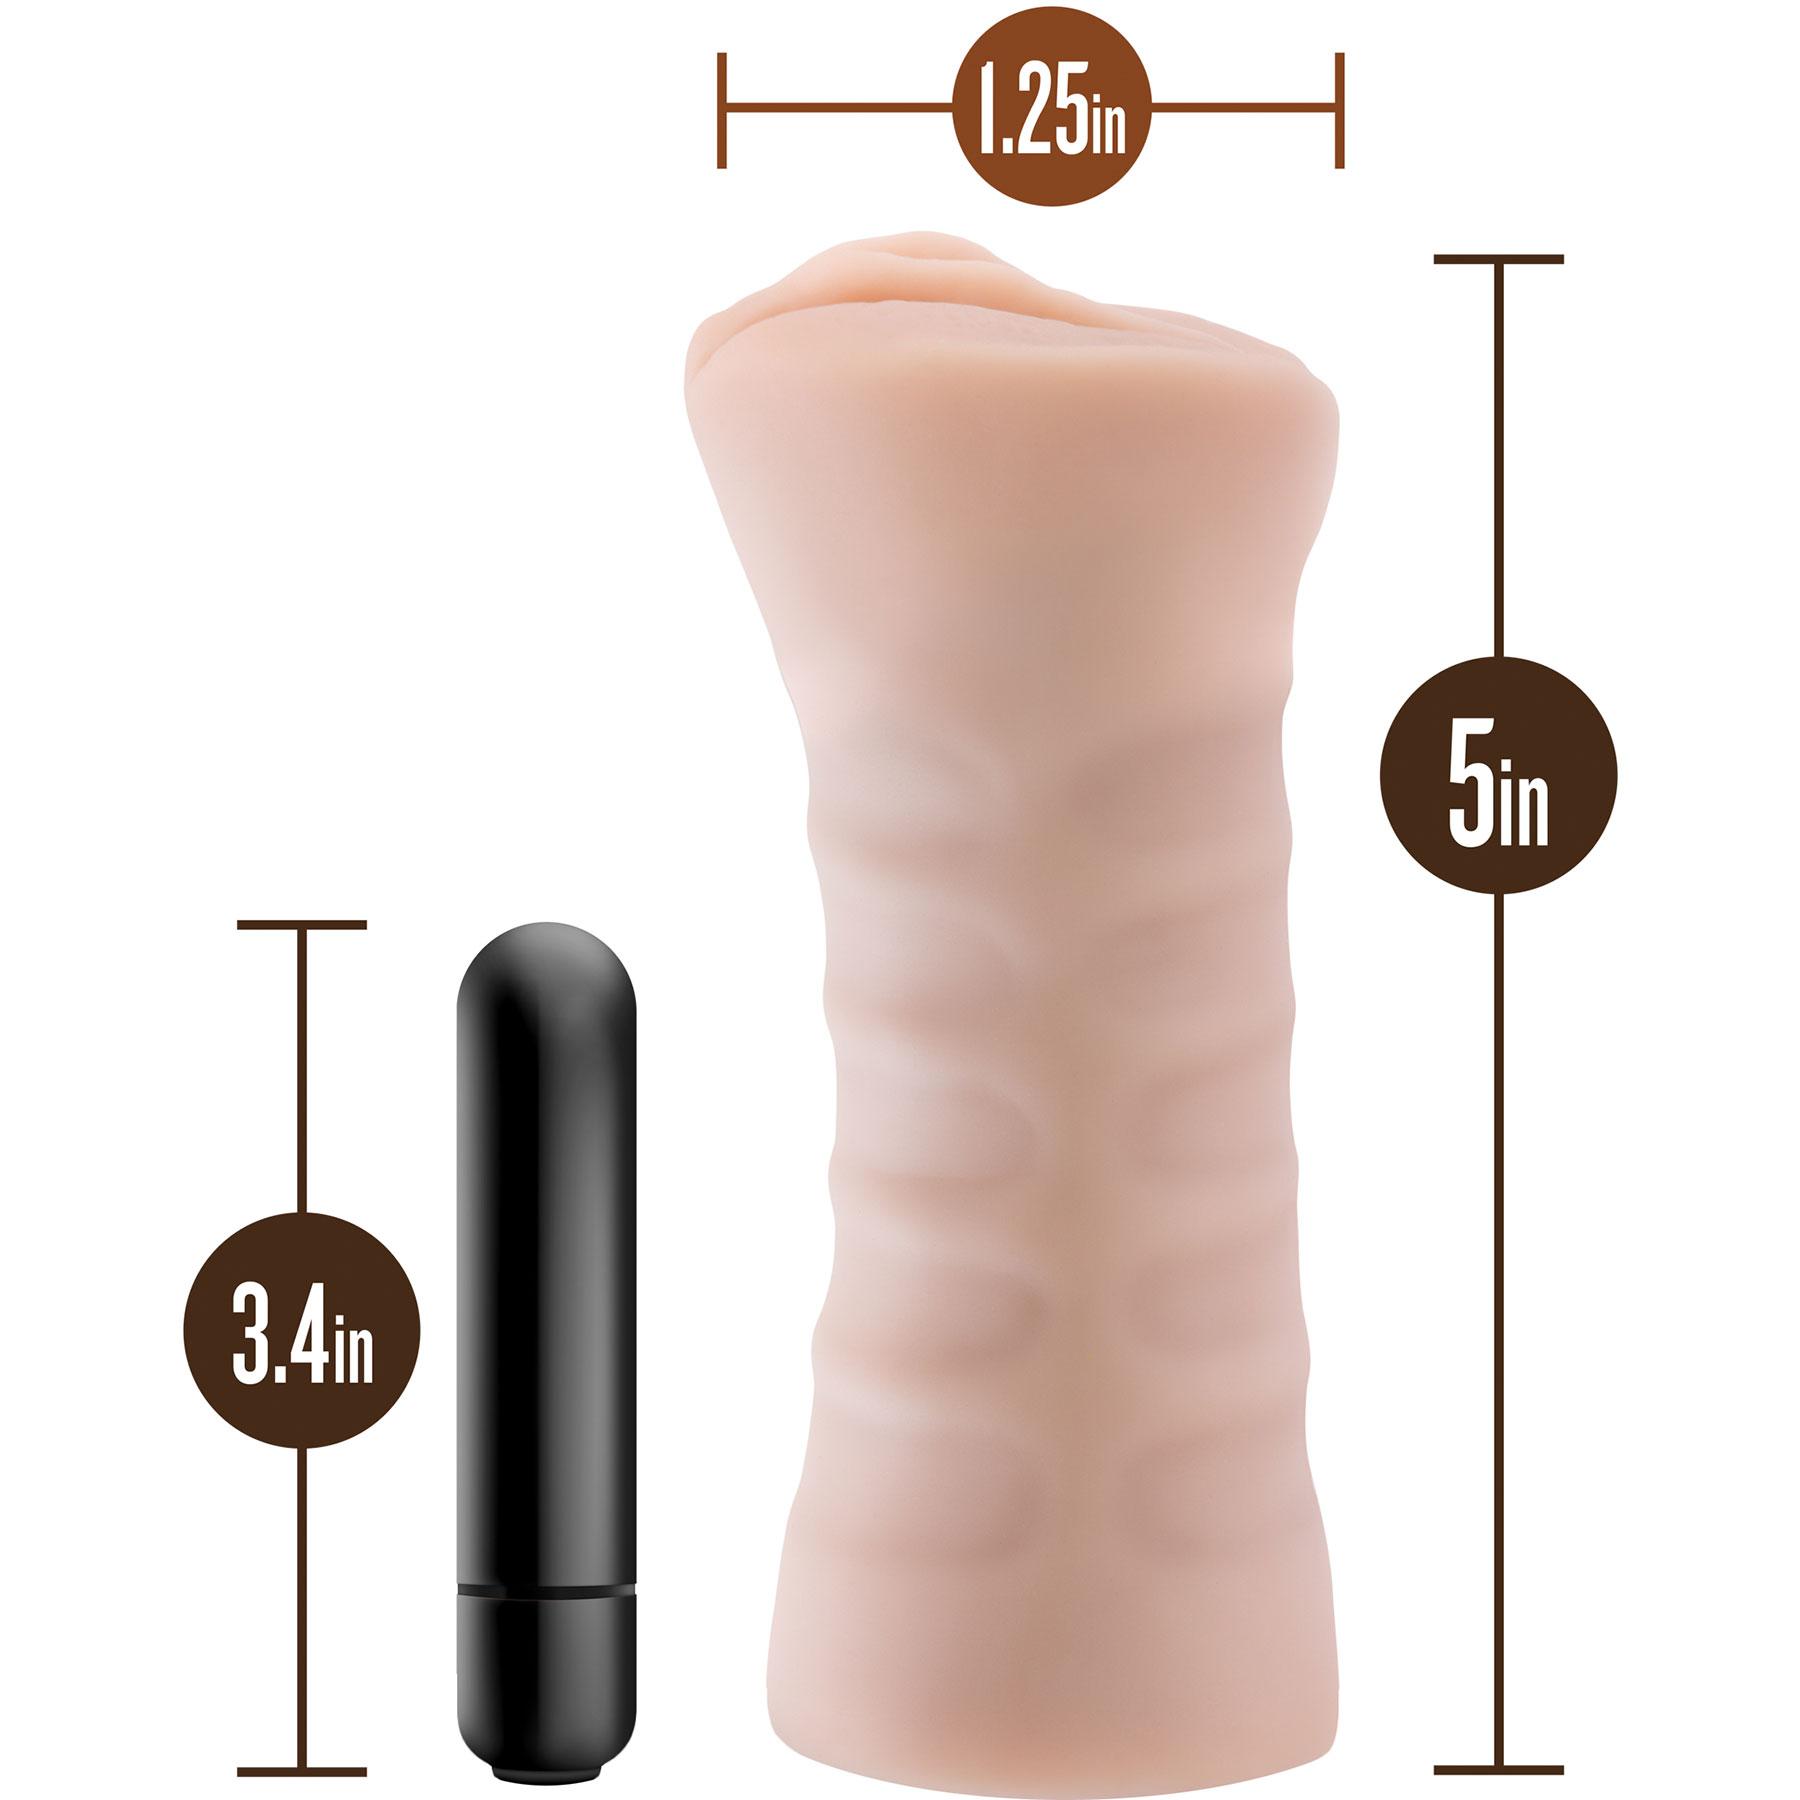 M for Men Rain Penis Masturbator - Measurements